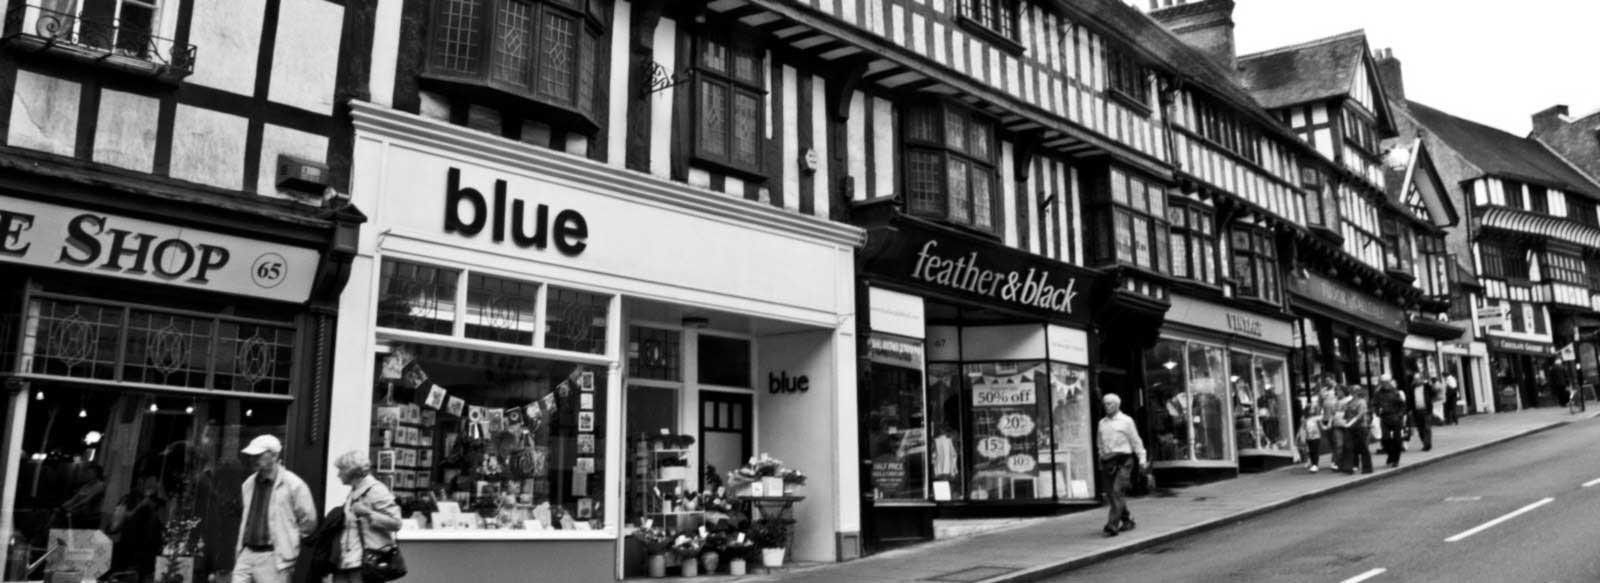 Shopping in Shrewsbury, Shropshire